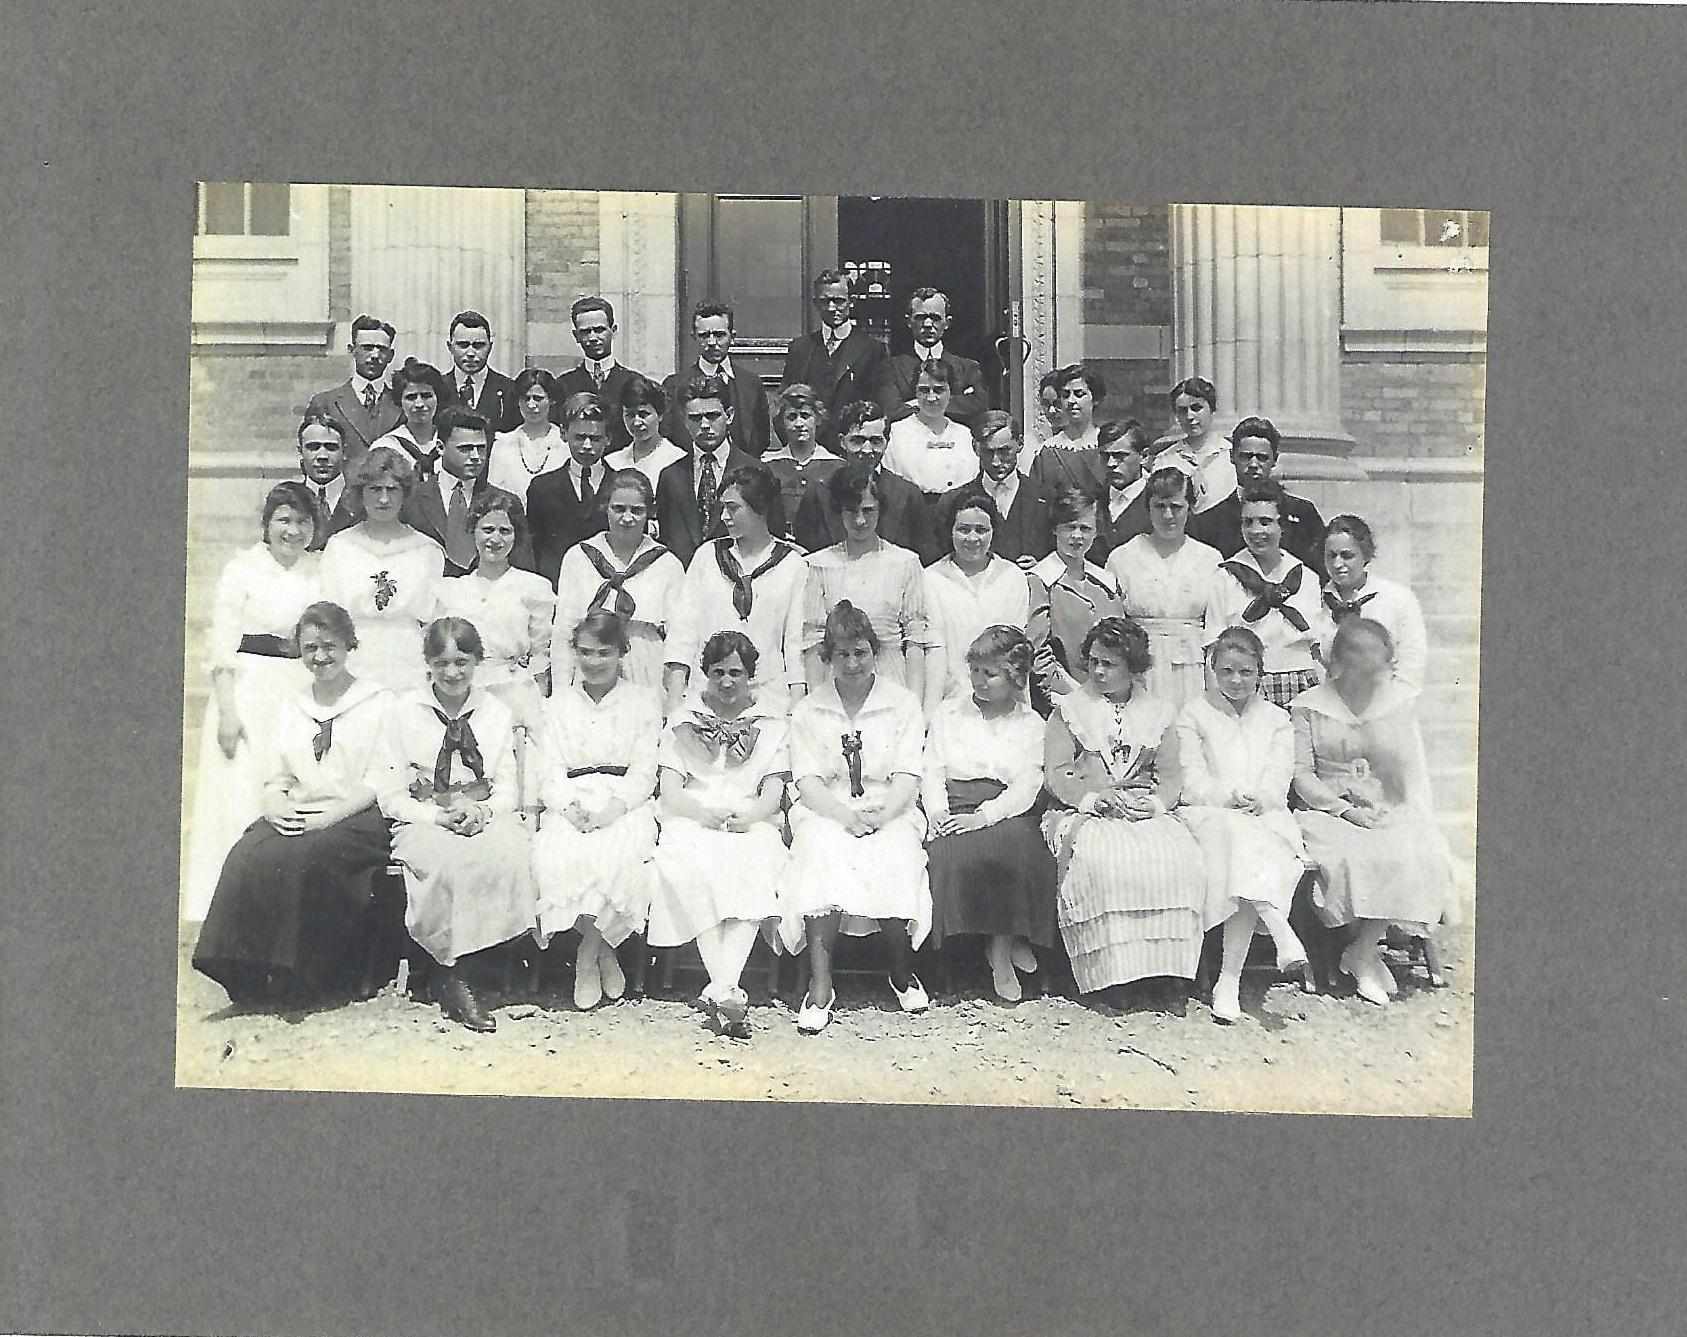 First Leonia High School graduating class 1917